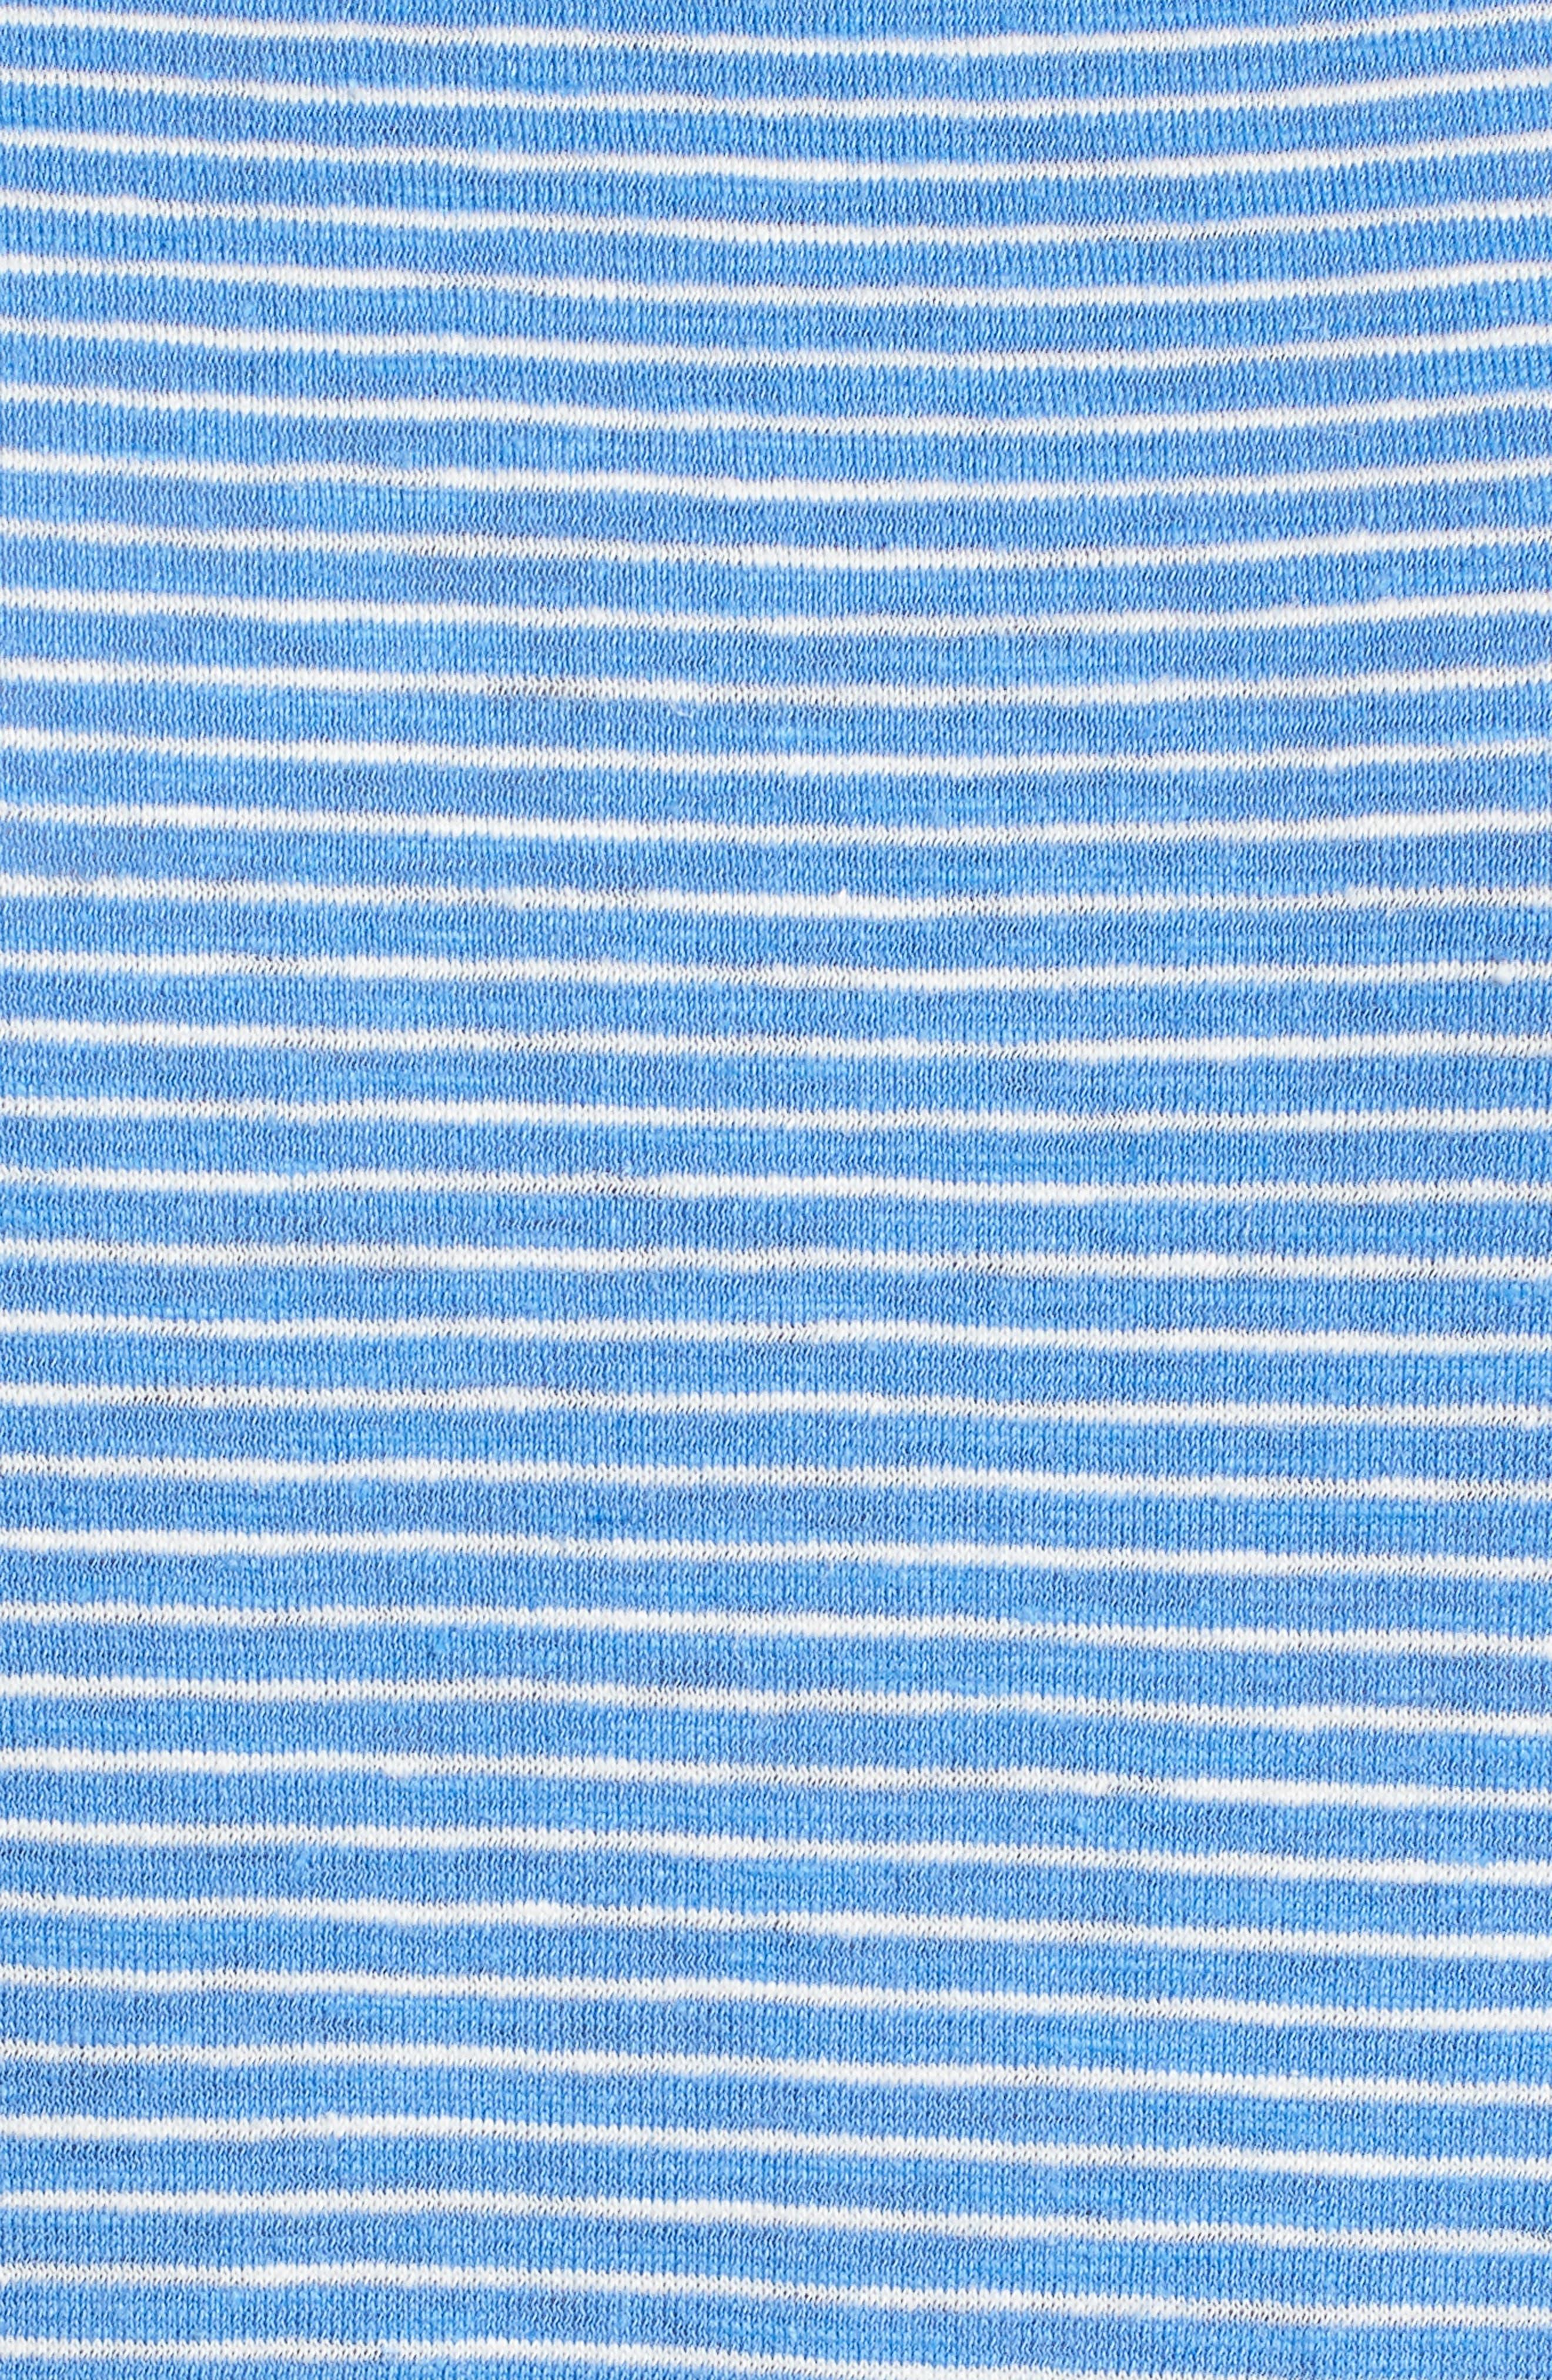 Hemp & Organic Cotton Jersey Dress,                             Alternate thumbnail 5, color,                             Bluebell